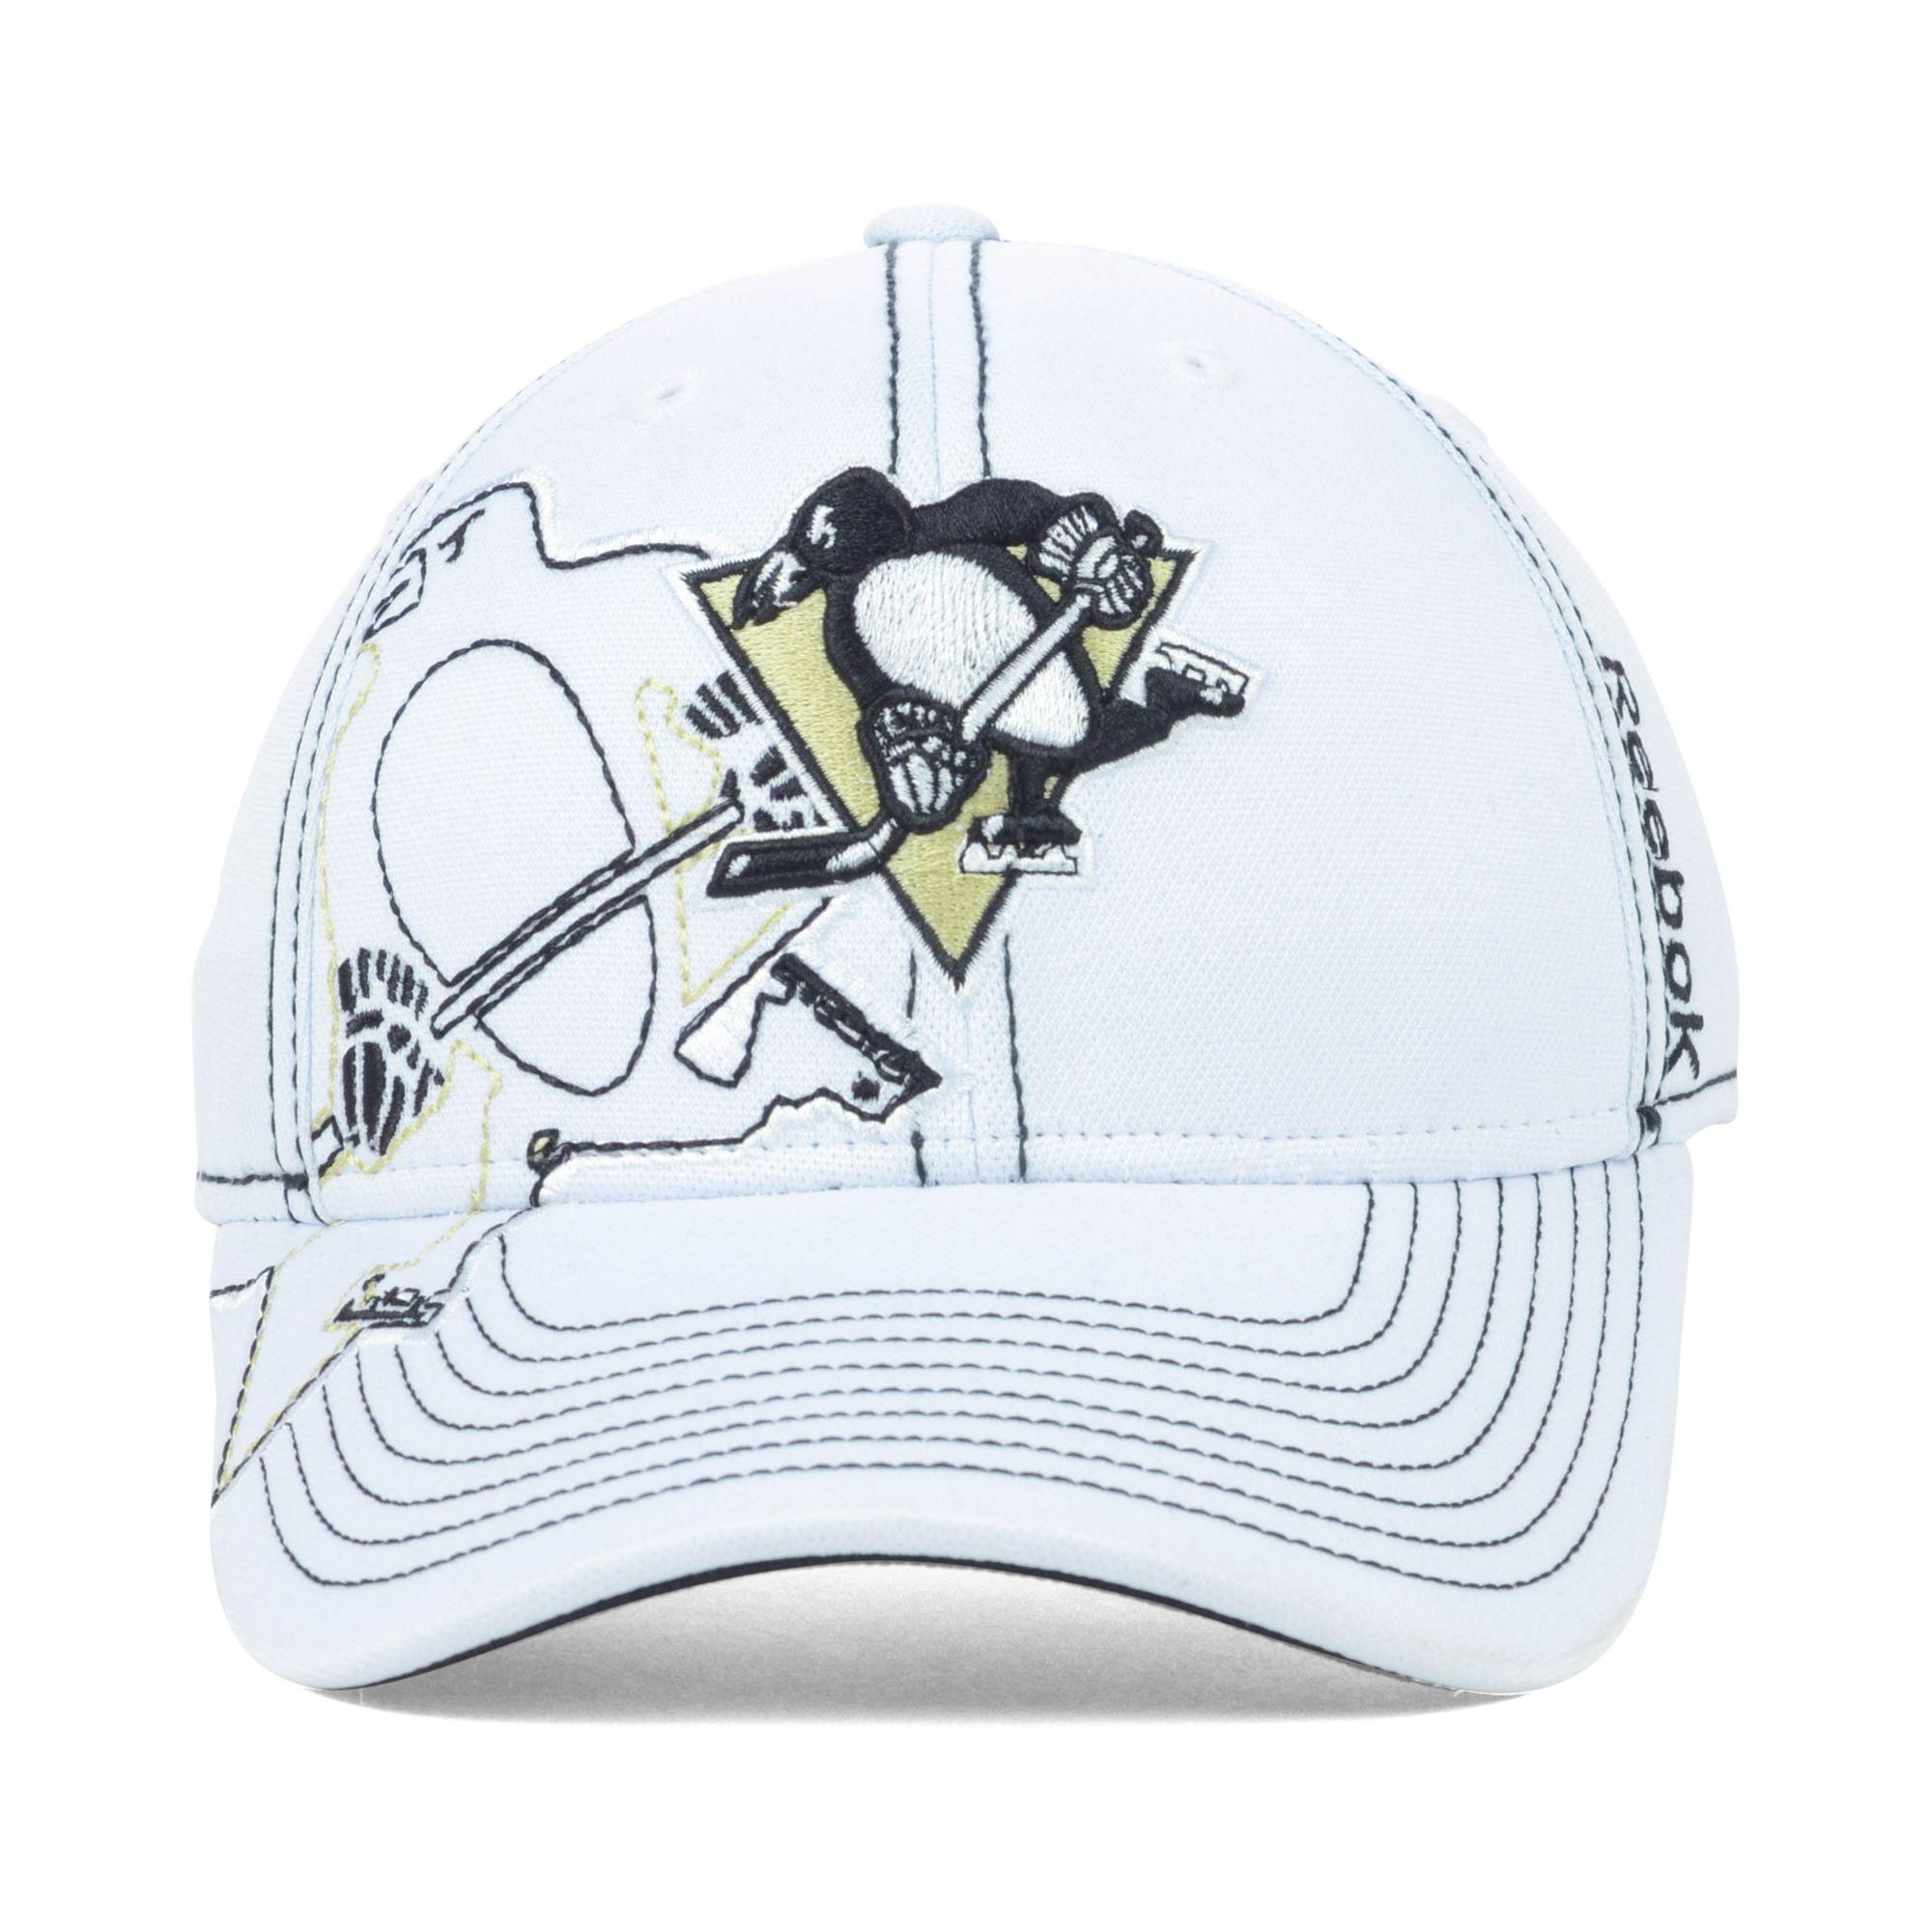 Lyst - Reebok Pittsburgh Penguins Nhl 2nd Season Draft Cap in White ... 6ba4a2c181eb